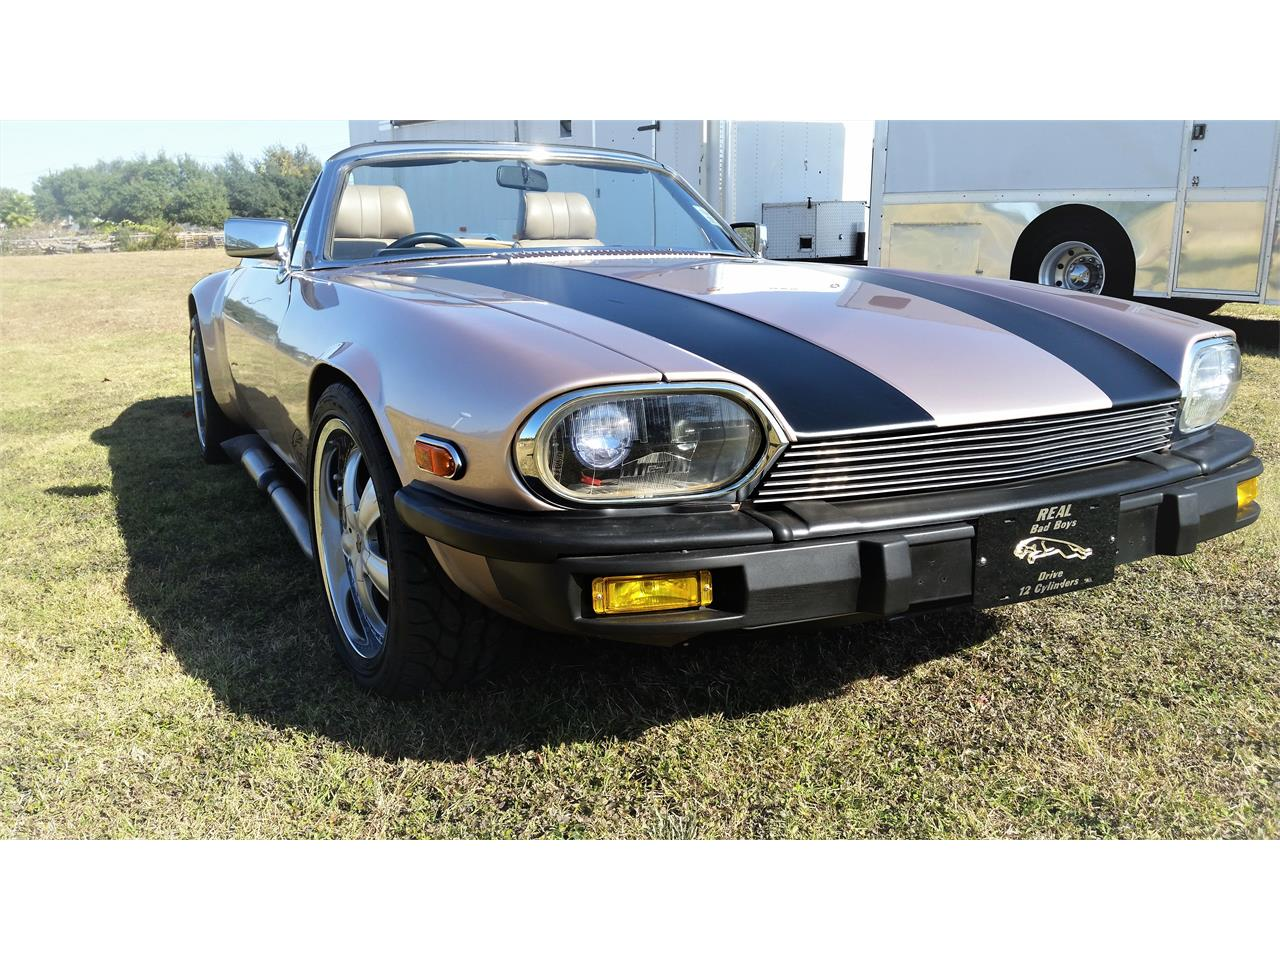 Classic Jaguar for Sale on ClassicCars.com